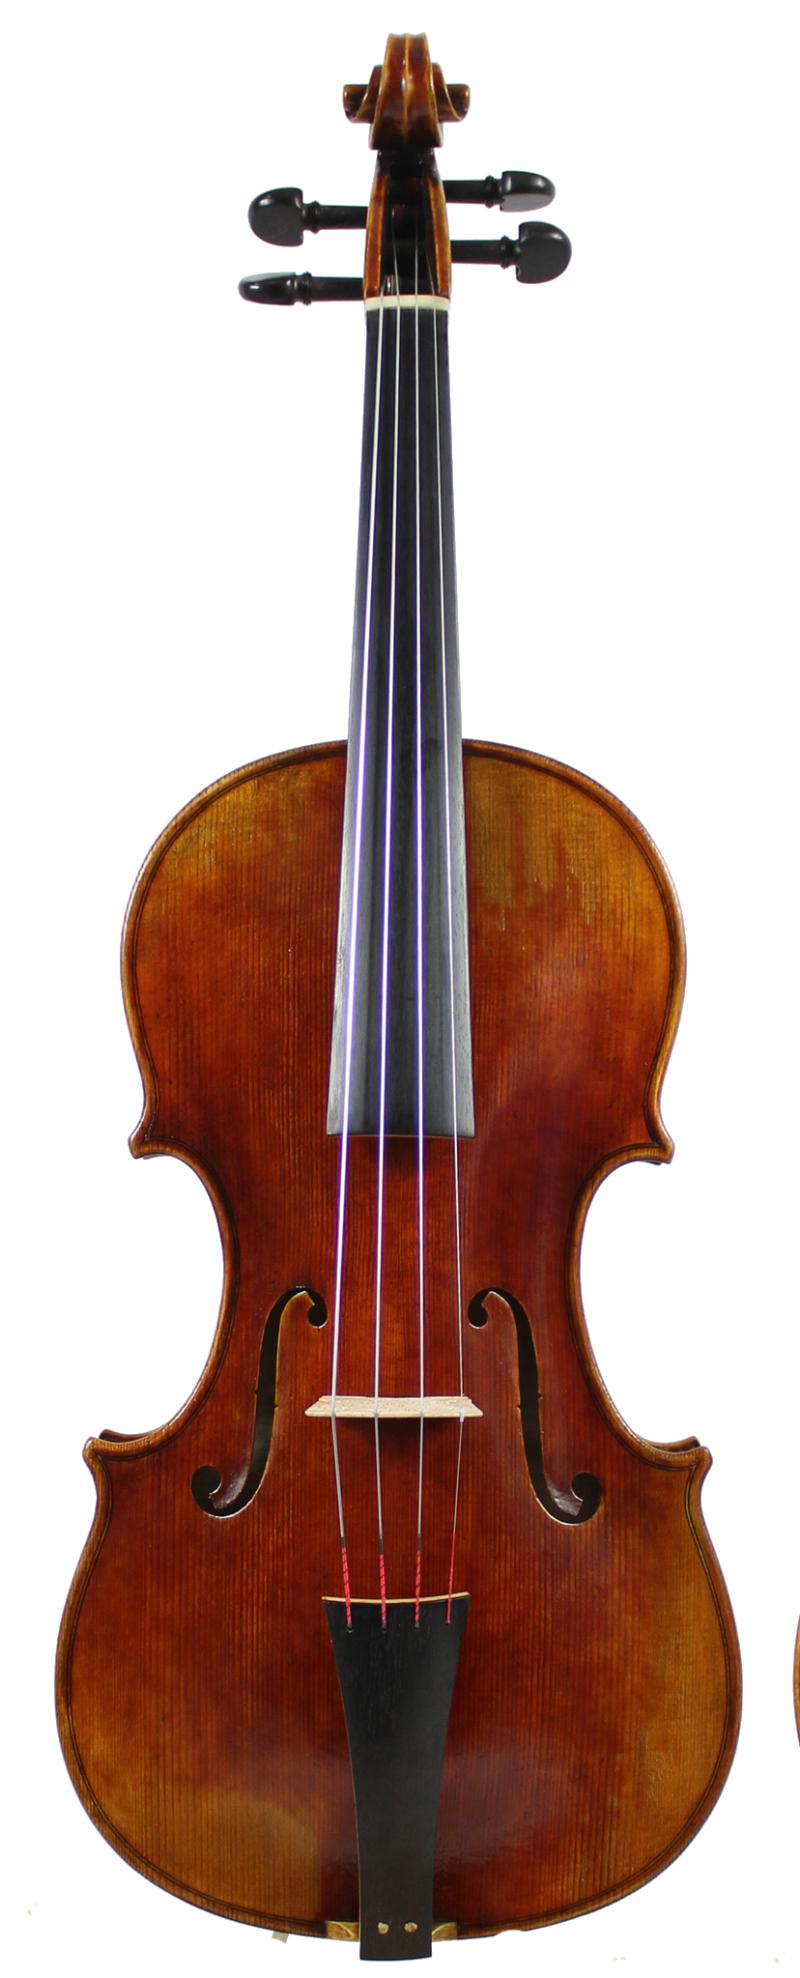 Stainer Baroque front full plain ebony